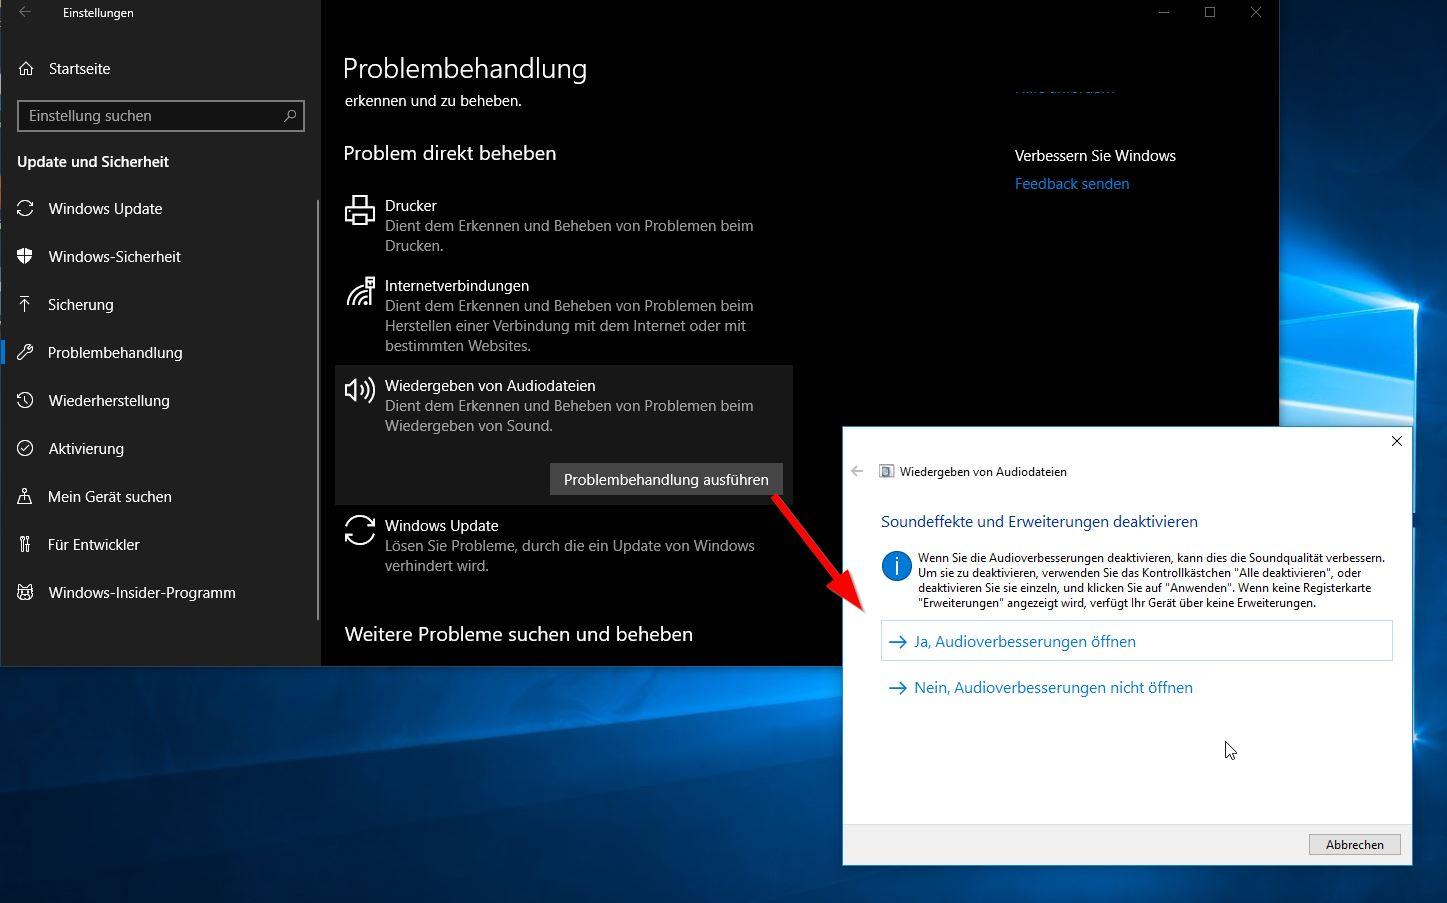 Windows Problembehebung